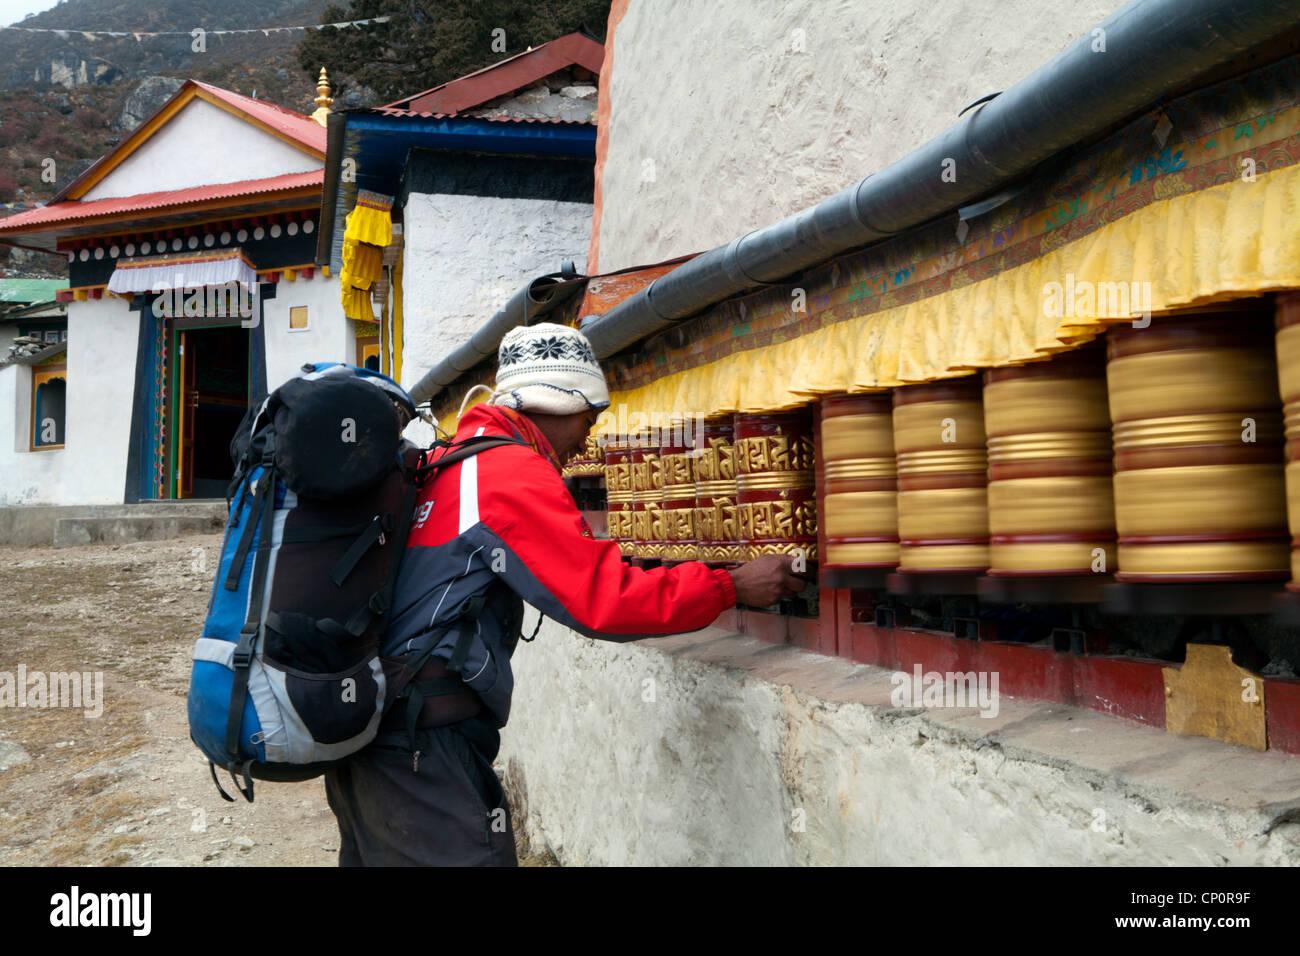 Spinning prayer wheels at the Khumjung Monastery - Stock Image